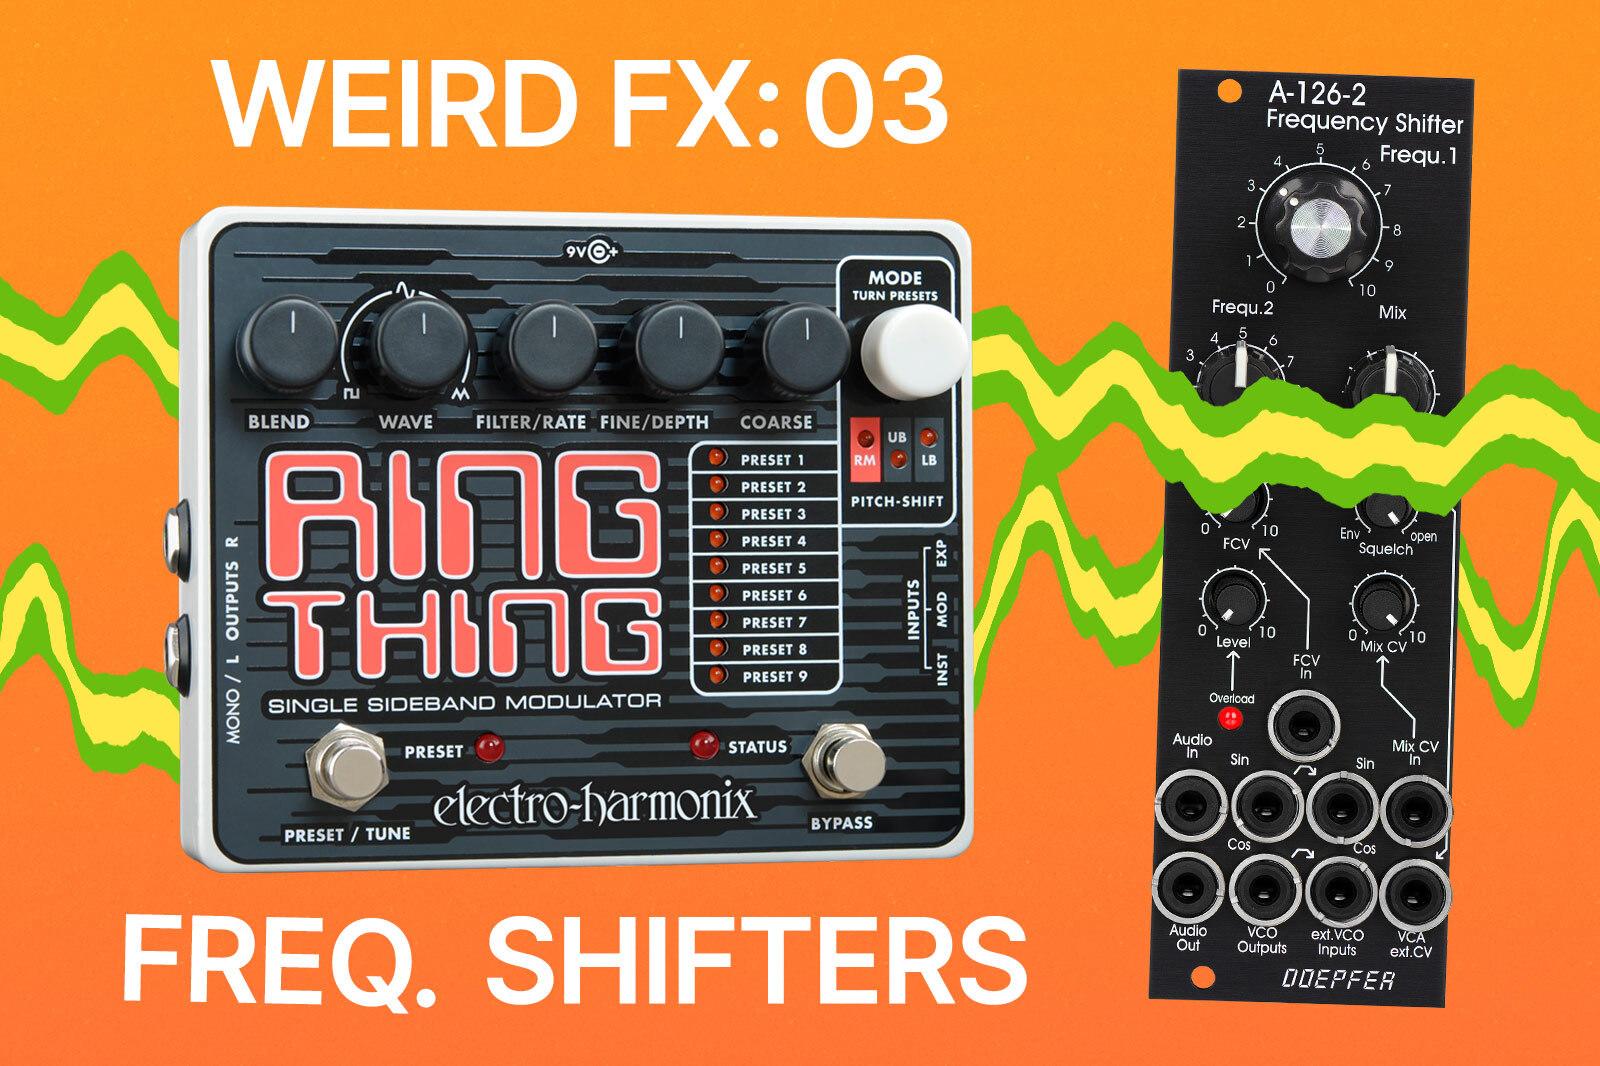 Weird FX: Frequency Shifters